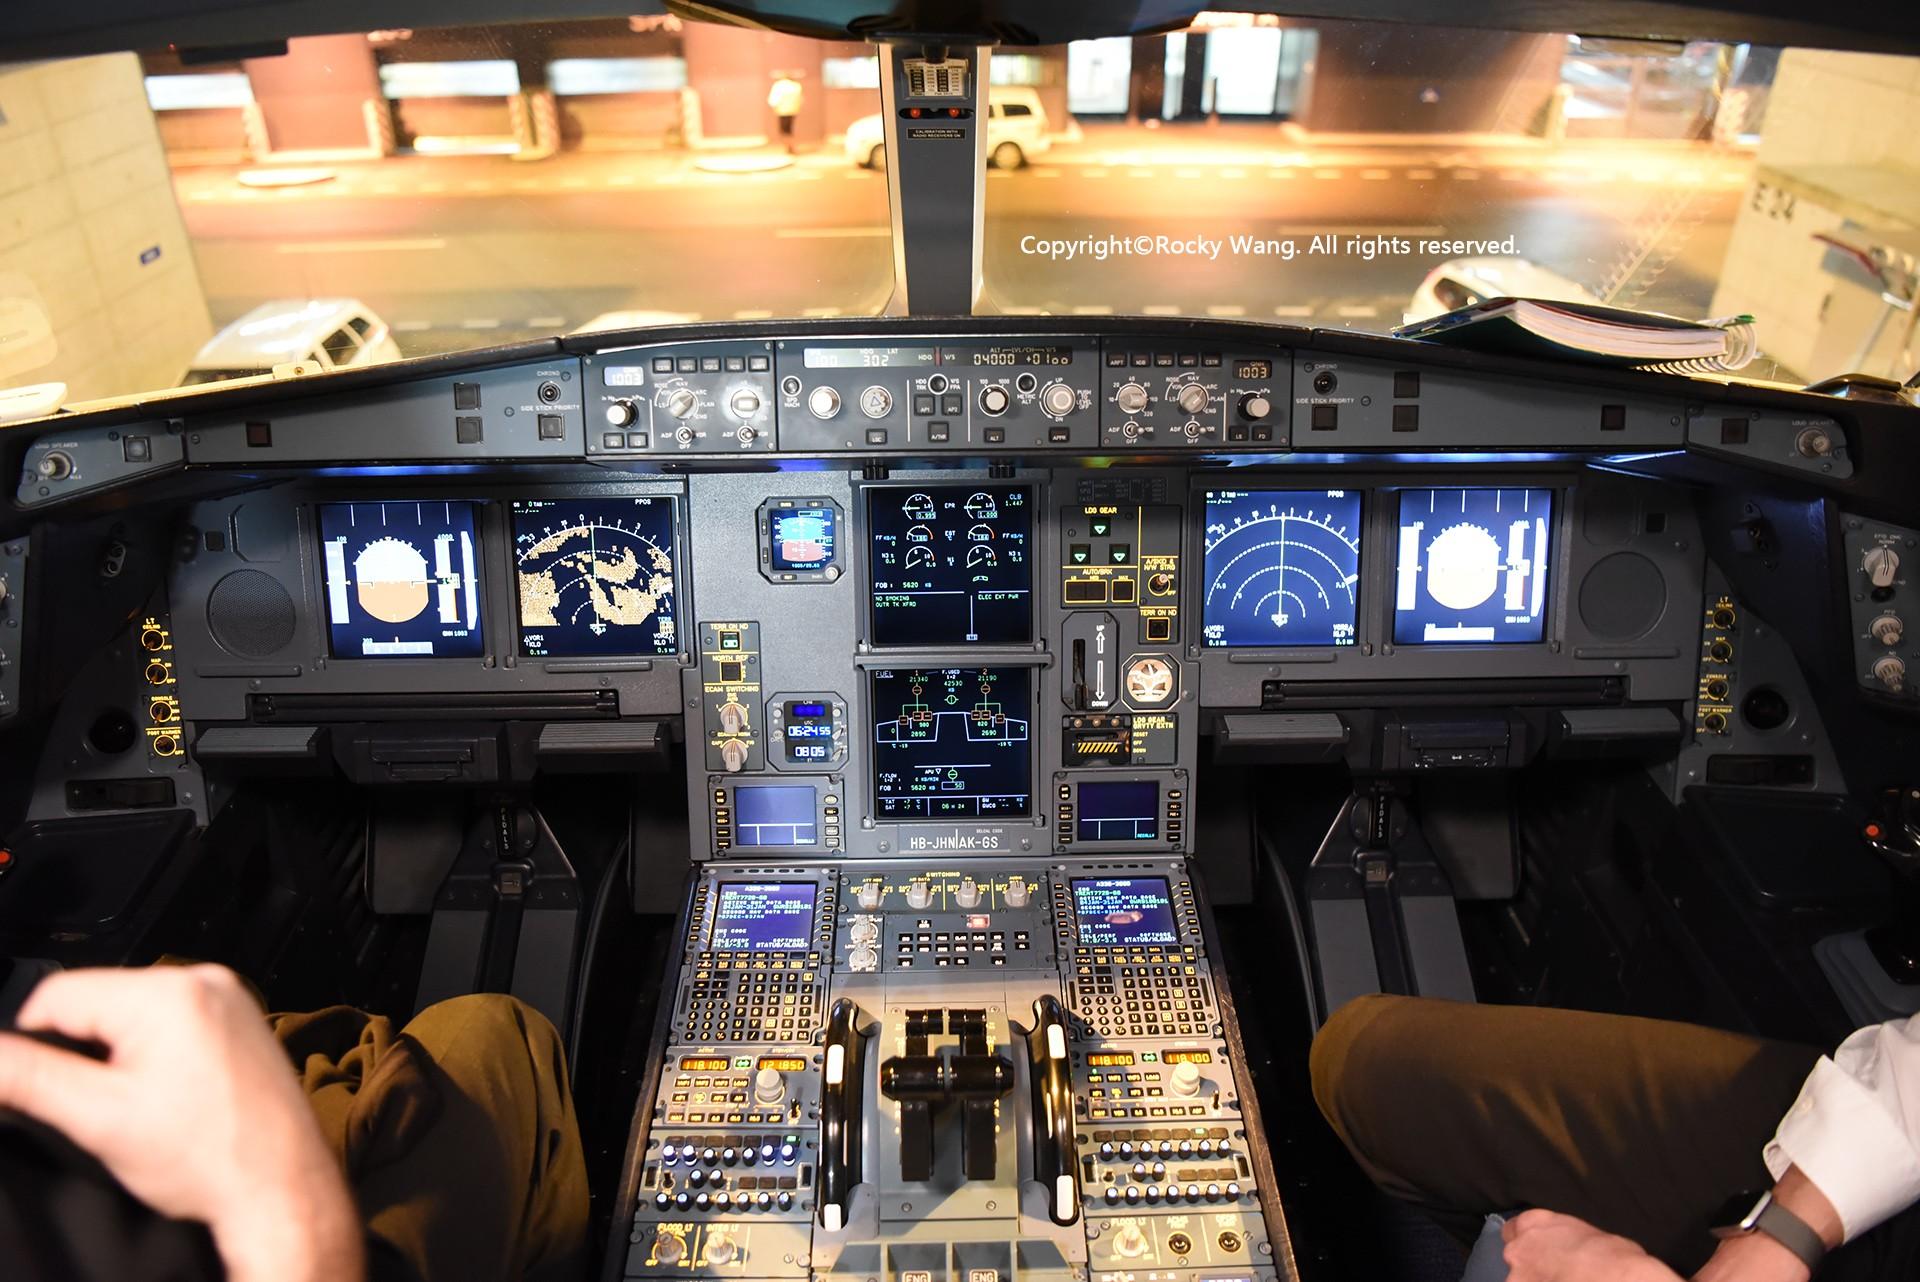 Re:[原创]简易版游记,纪念一次30段的环球飞行和一些碎碎念 AIRBUS A330-343 HB-JHN Zurich-Kloten Airport